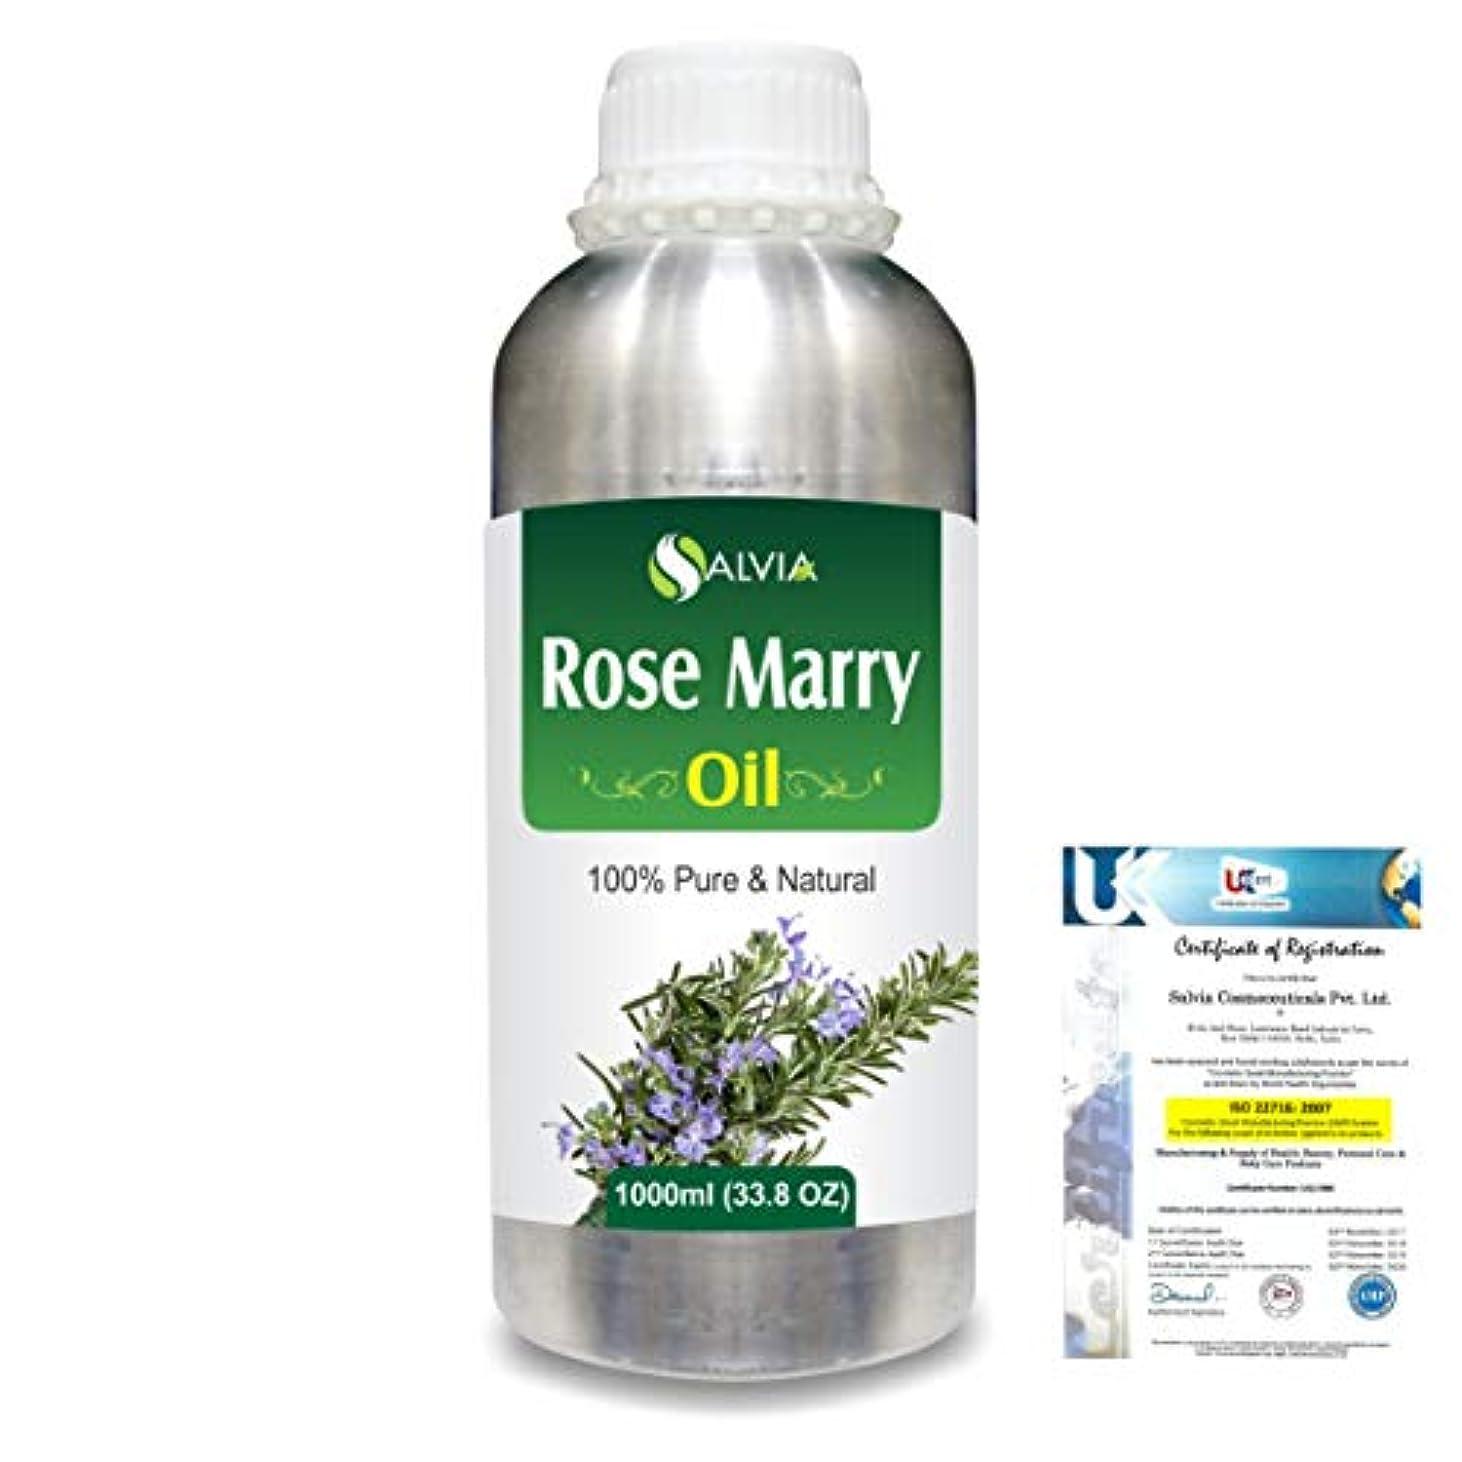 Rose Marry (Rosmarinus officinalis) 100% Natural Pure Essential Oil 1000ml/33.8fl.oz.